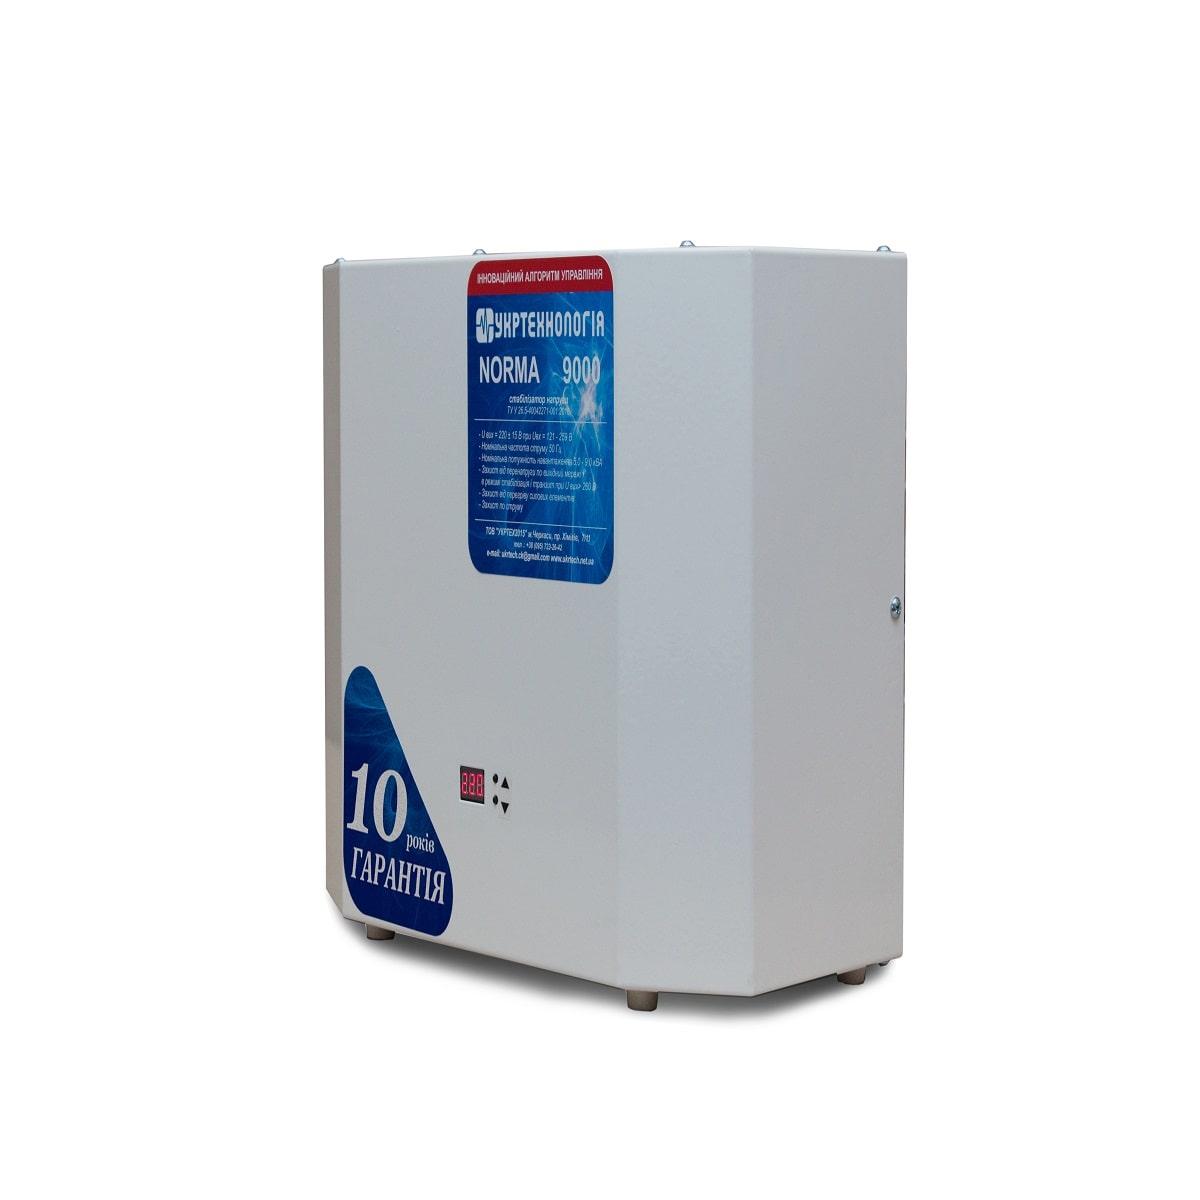 Для дома - Стабилизатор напряжения 9 кВт NORMA 000001376 - Фото 3